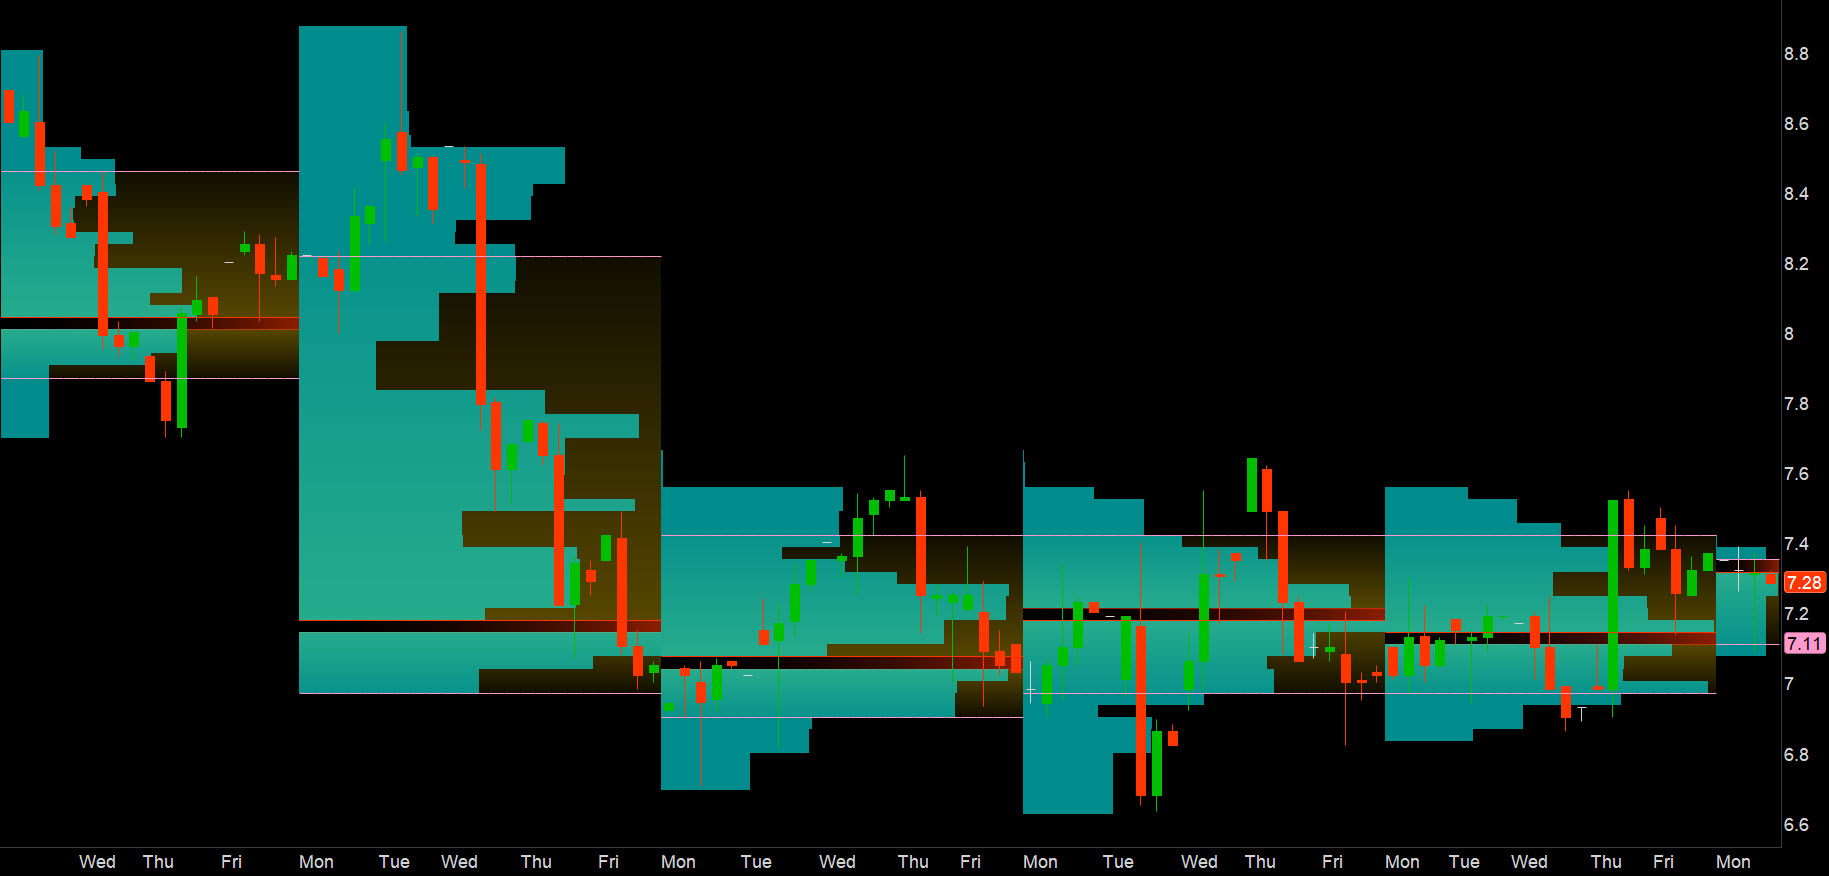 overlay of volume profile over price bars in thinkorswim